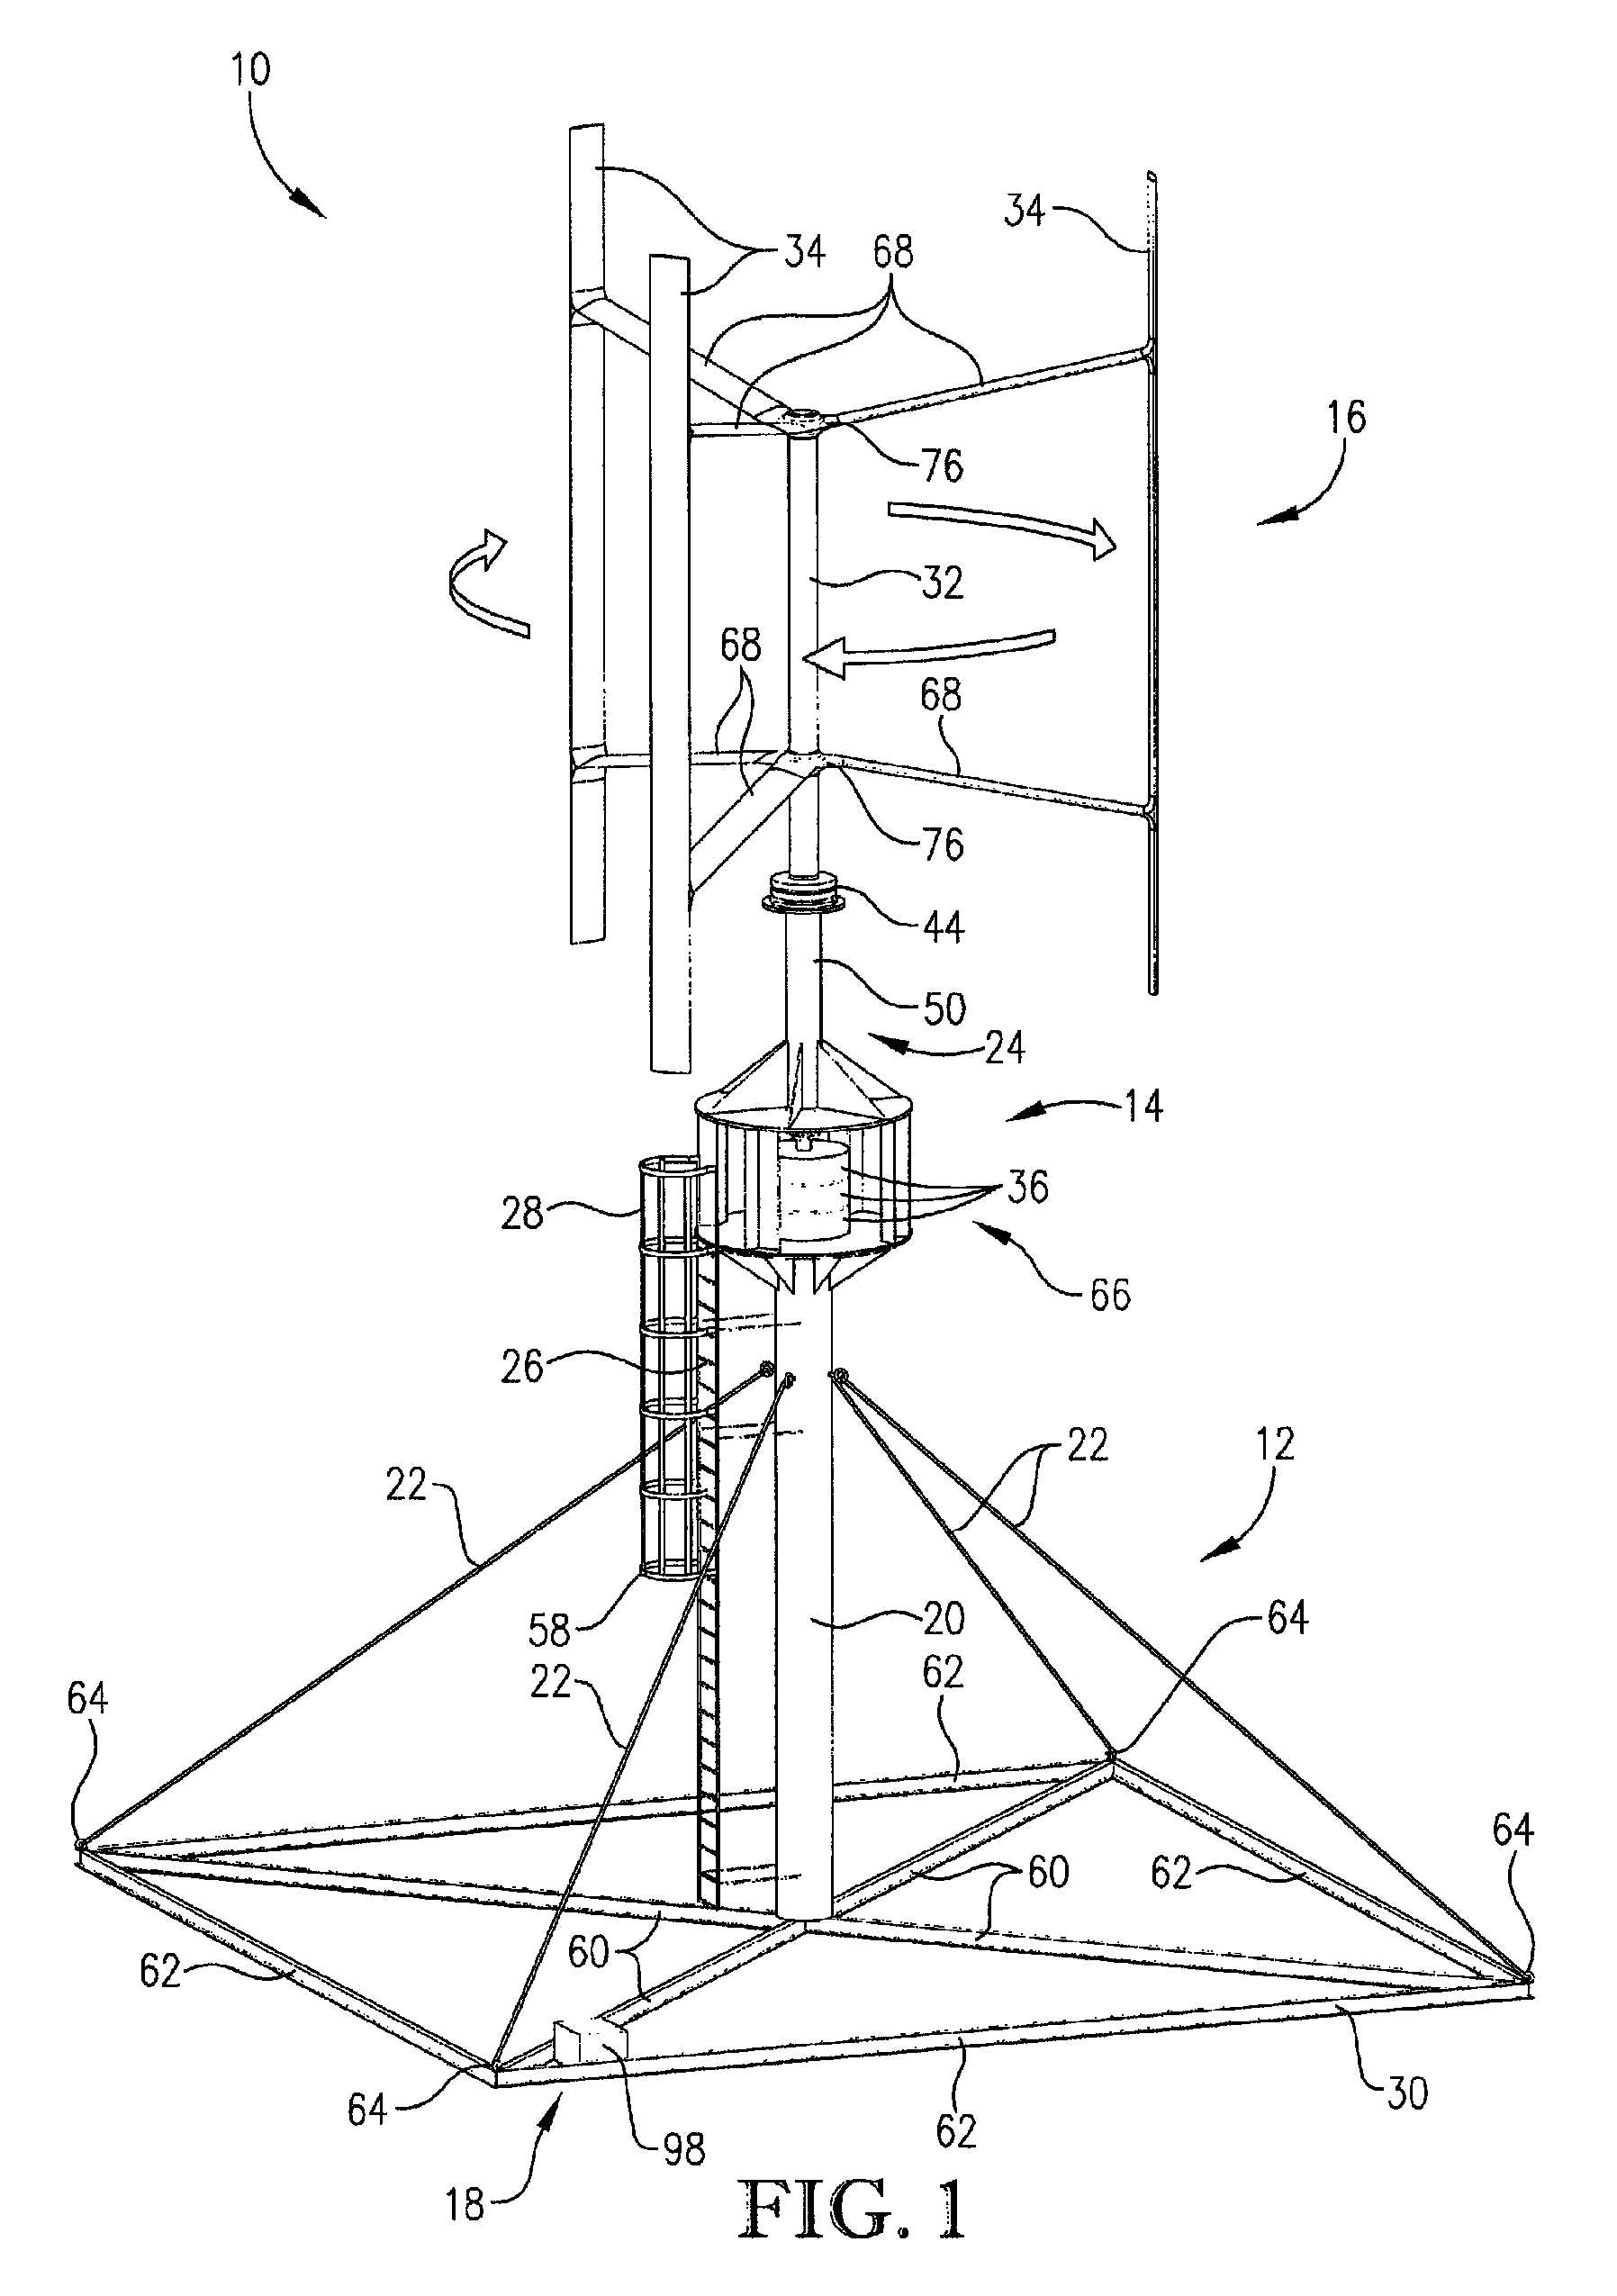 patente us8258647 - vertical axis wind turbine